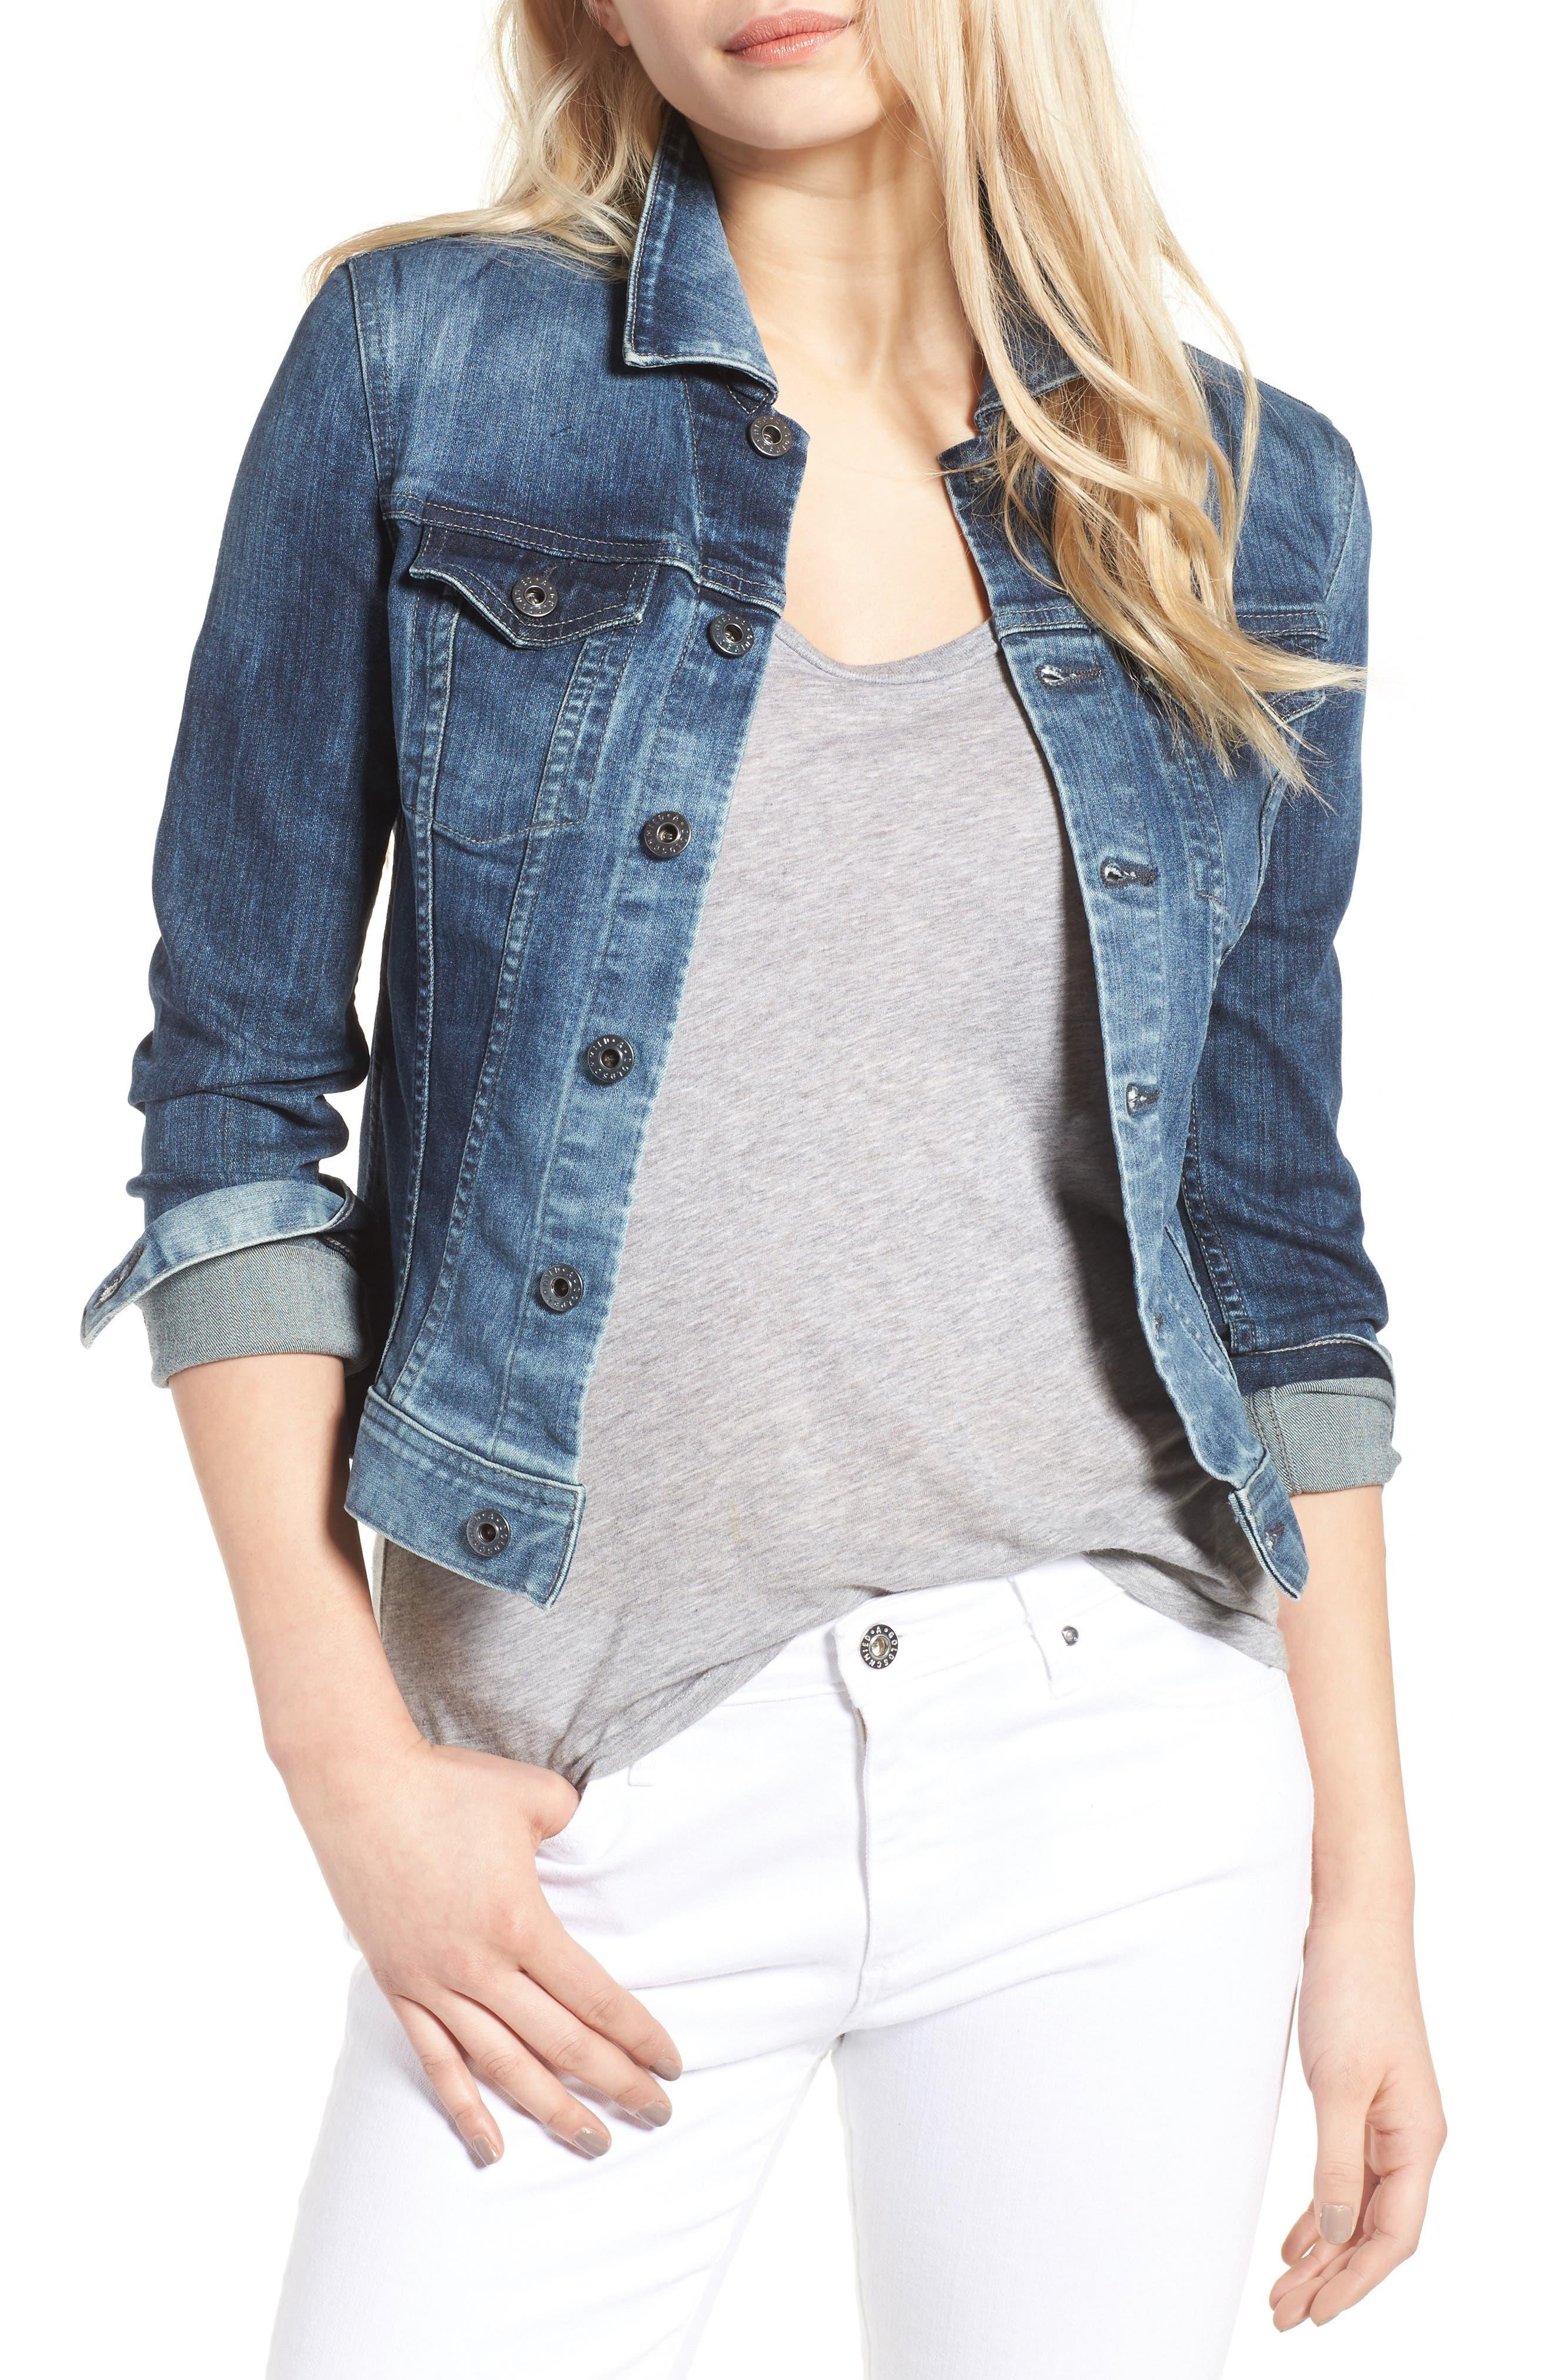 Alternate Image 1 Selected - AG 'Robyn' Denim Jacket (Blue Cove)